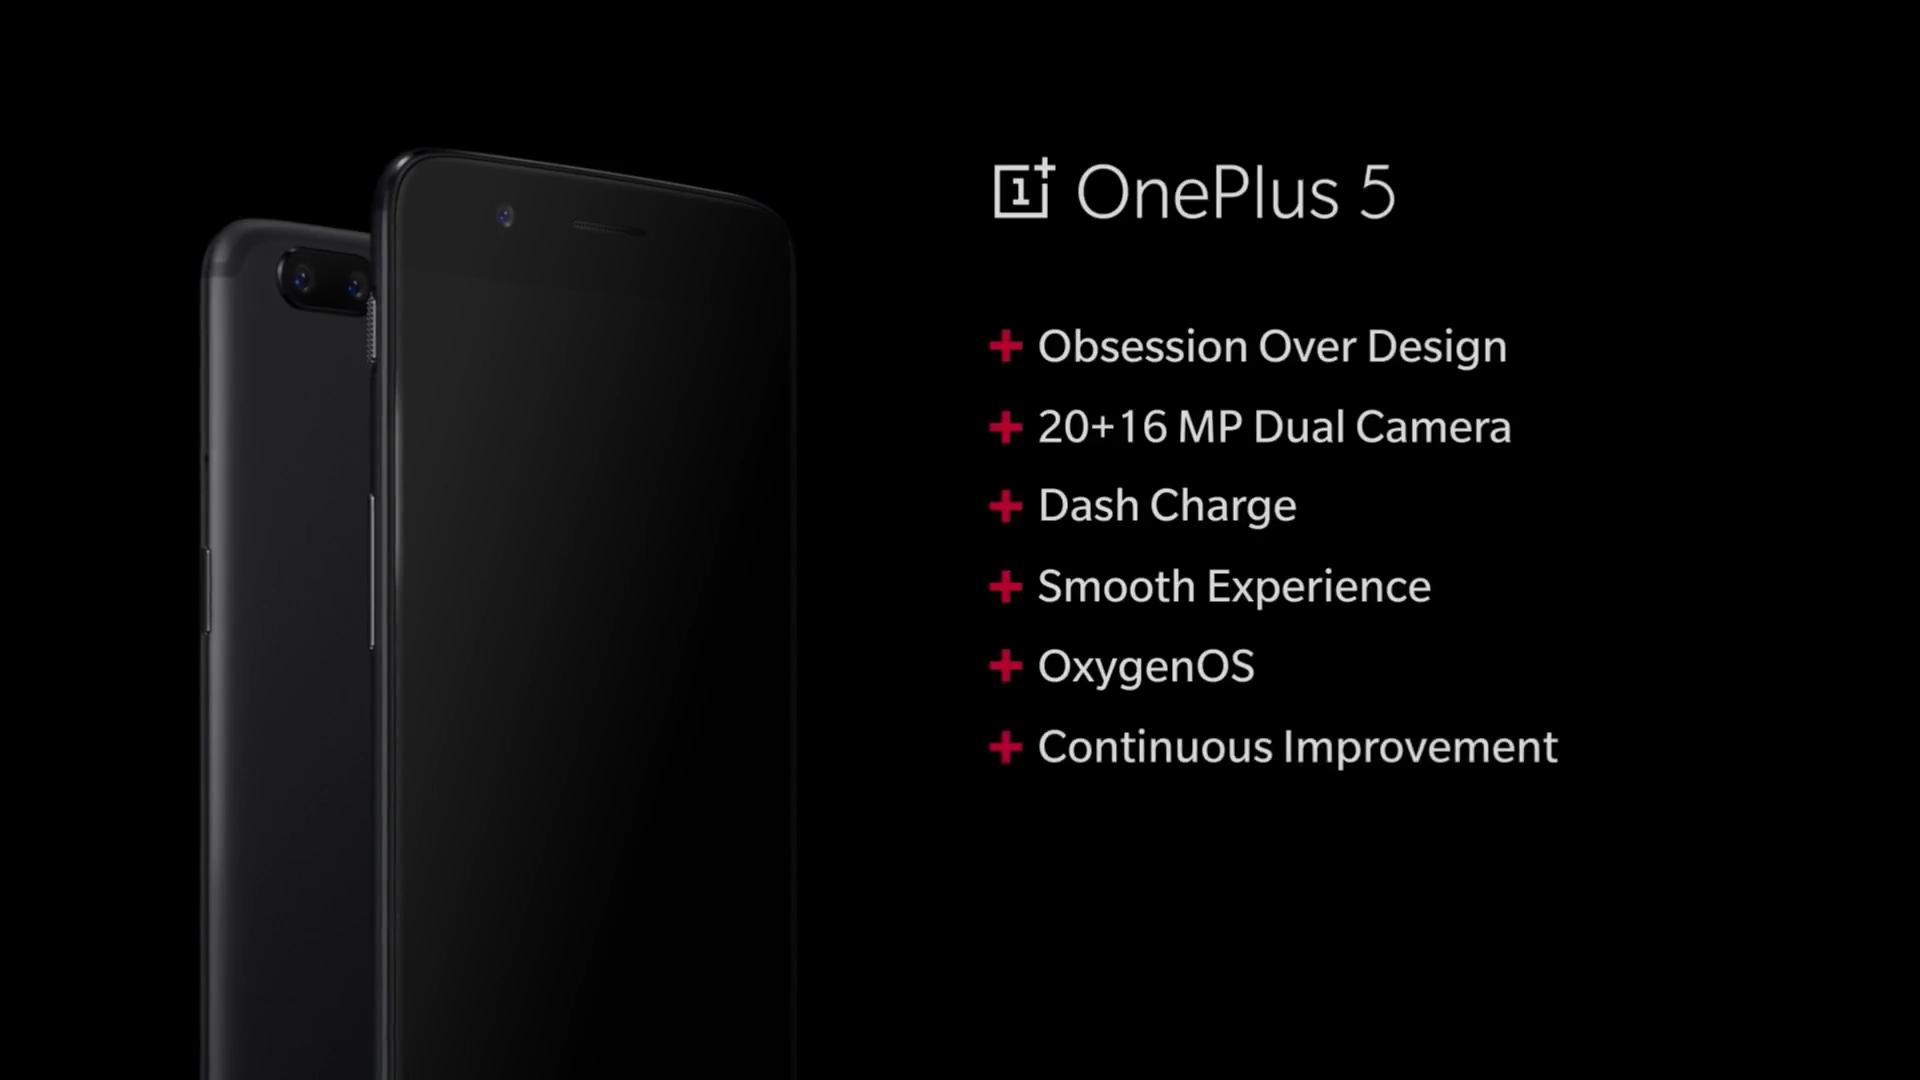 OnePlus 5 keynote summary 1 1